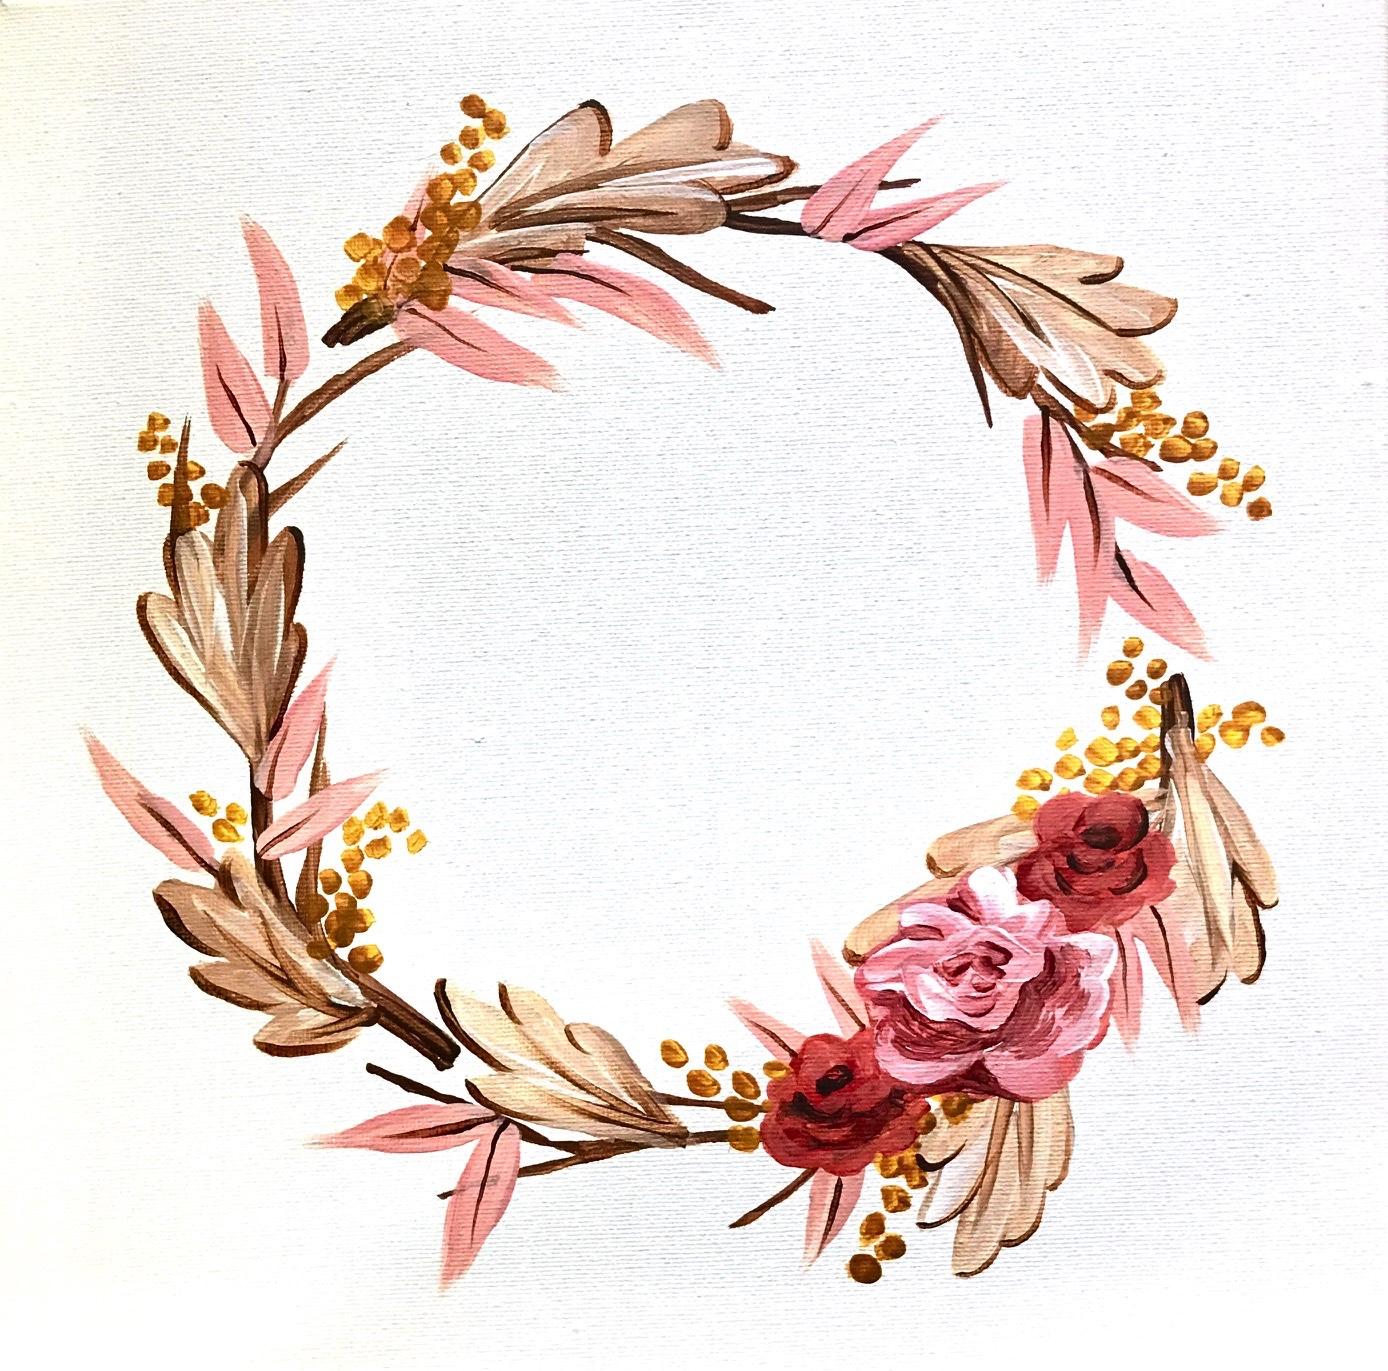 Golden_Peachy_Wreath